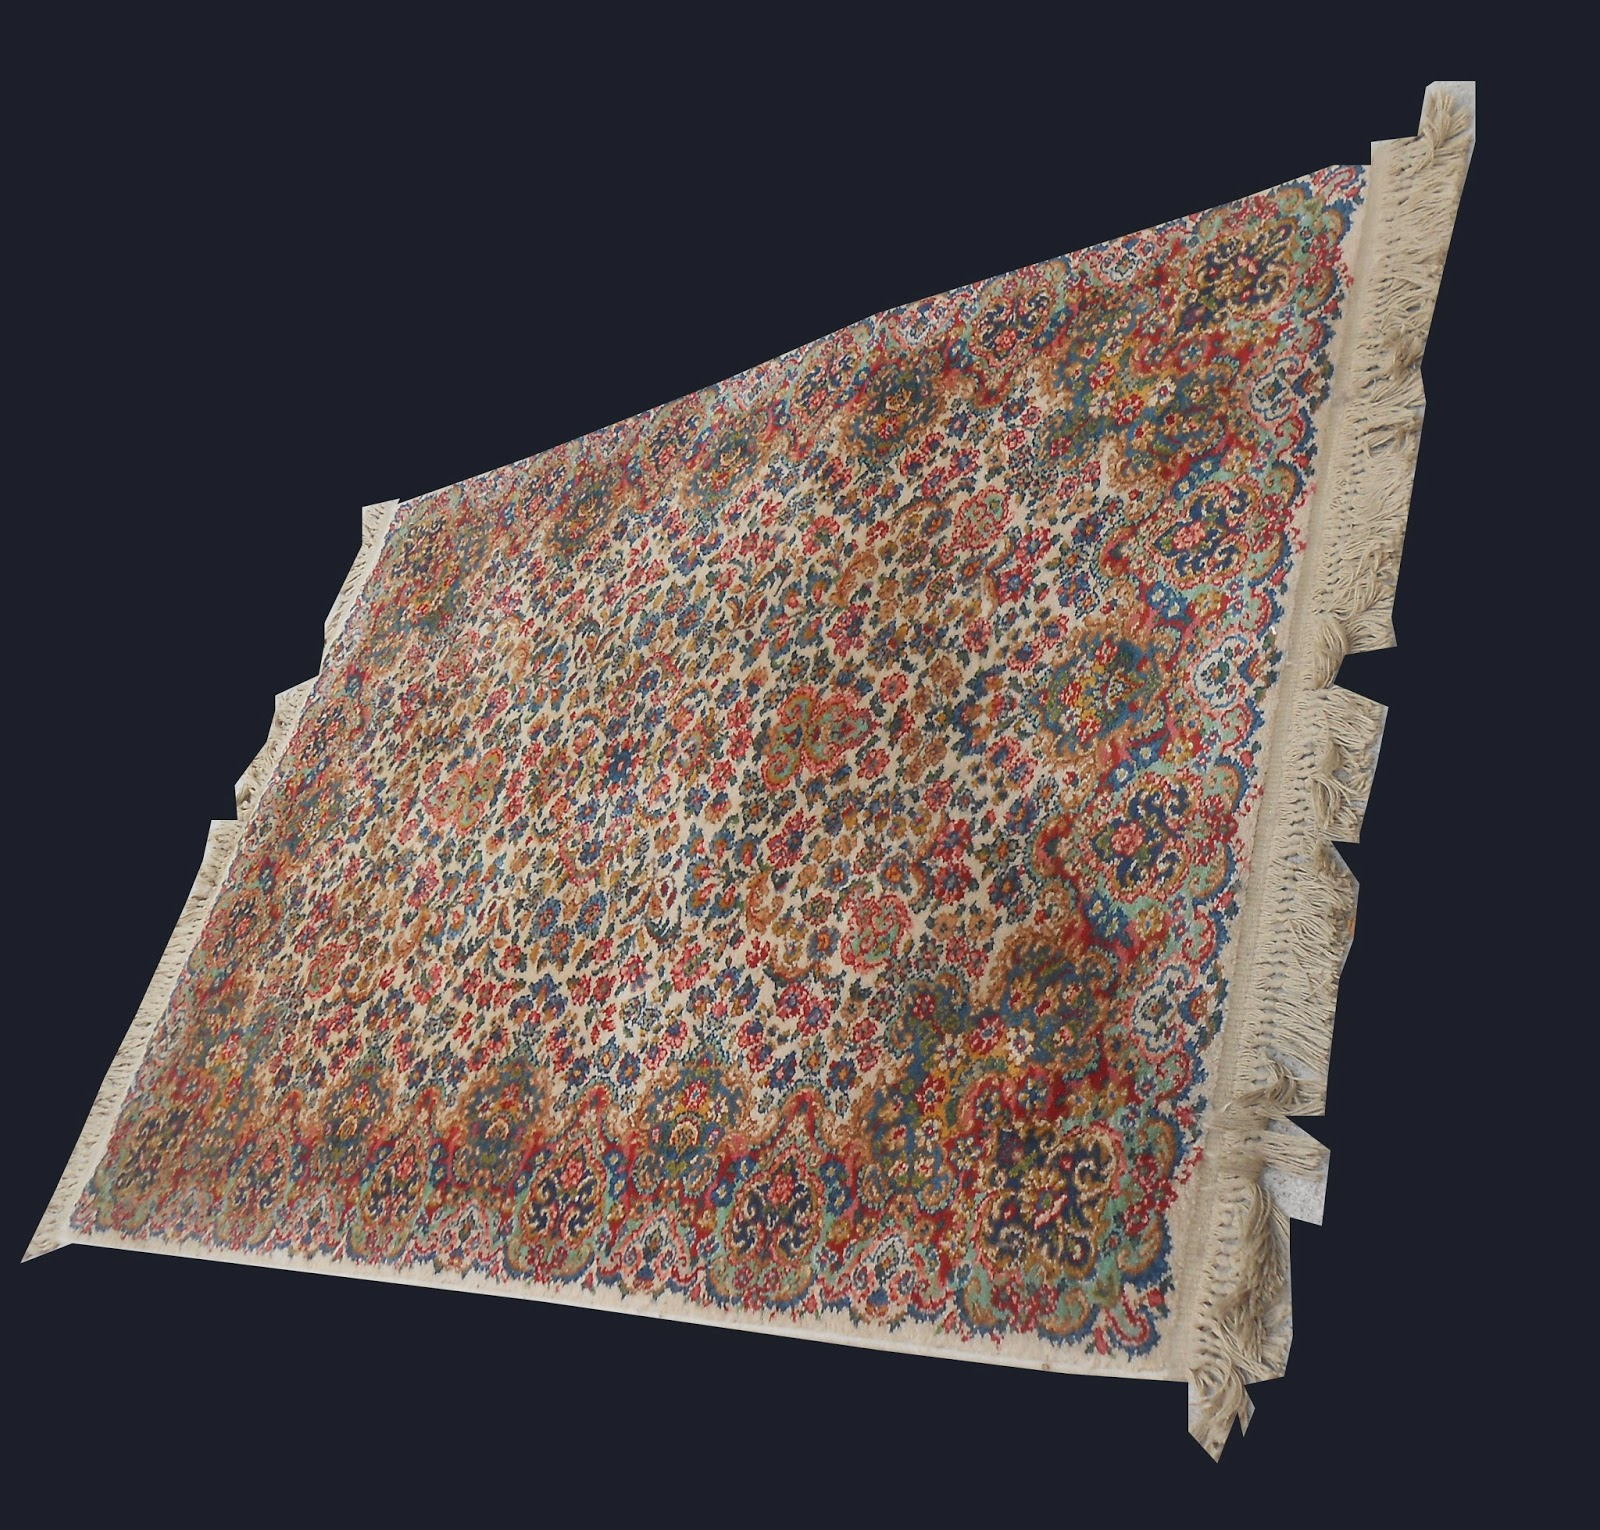 Uhuru Furniture Amp Collectibles Karastan 100 Wool Area